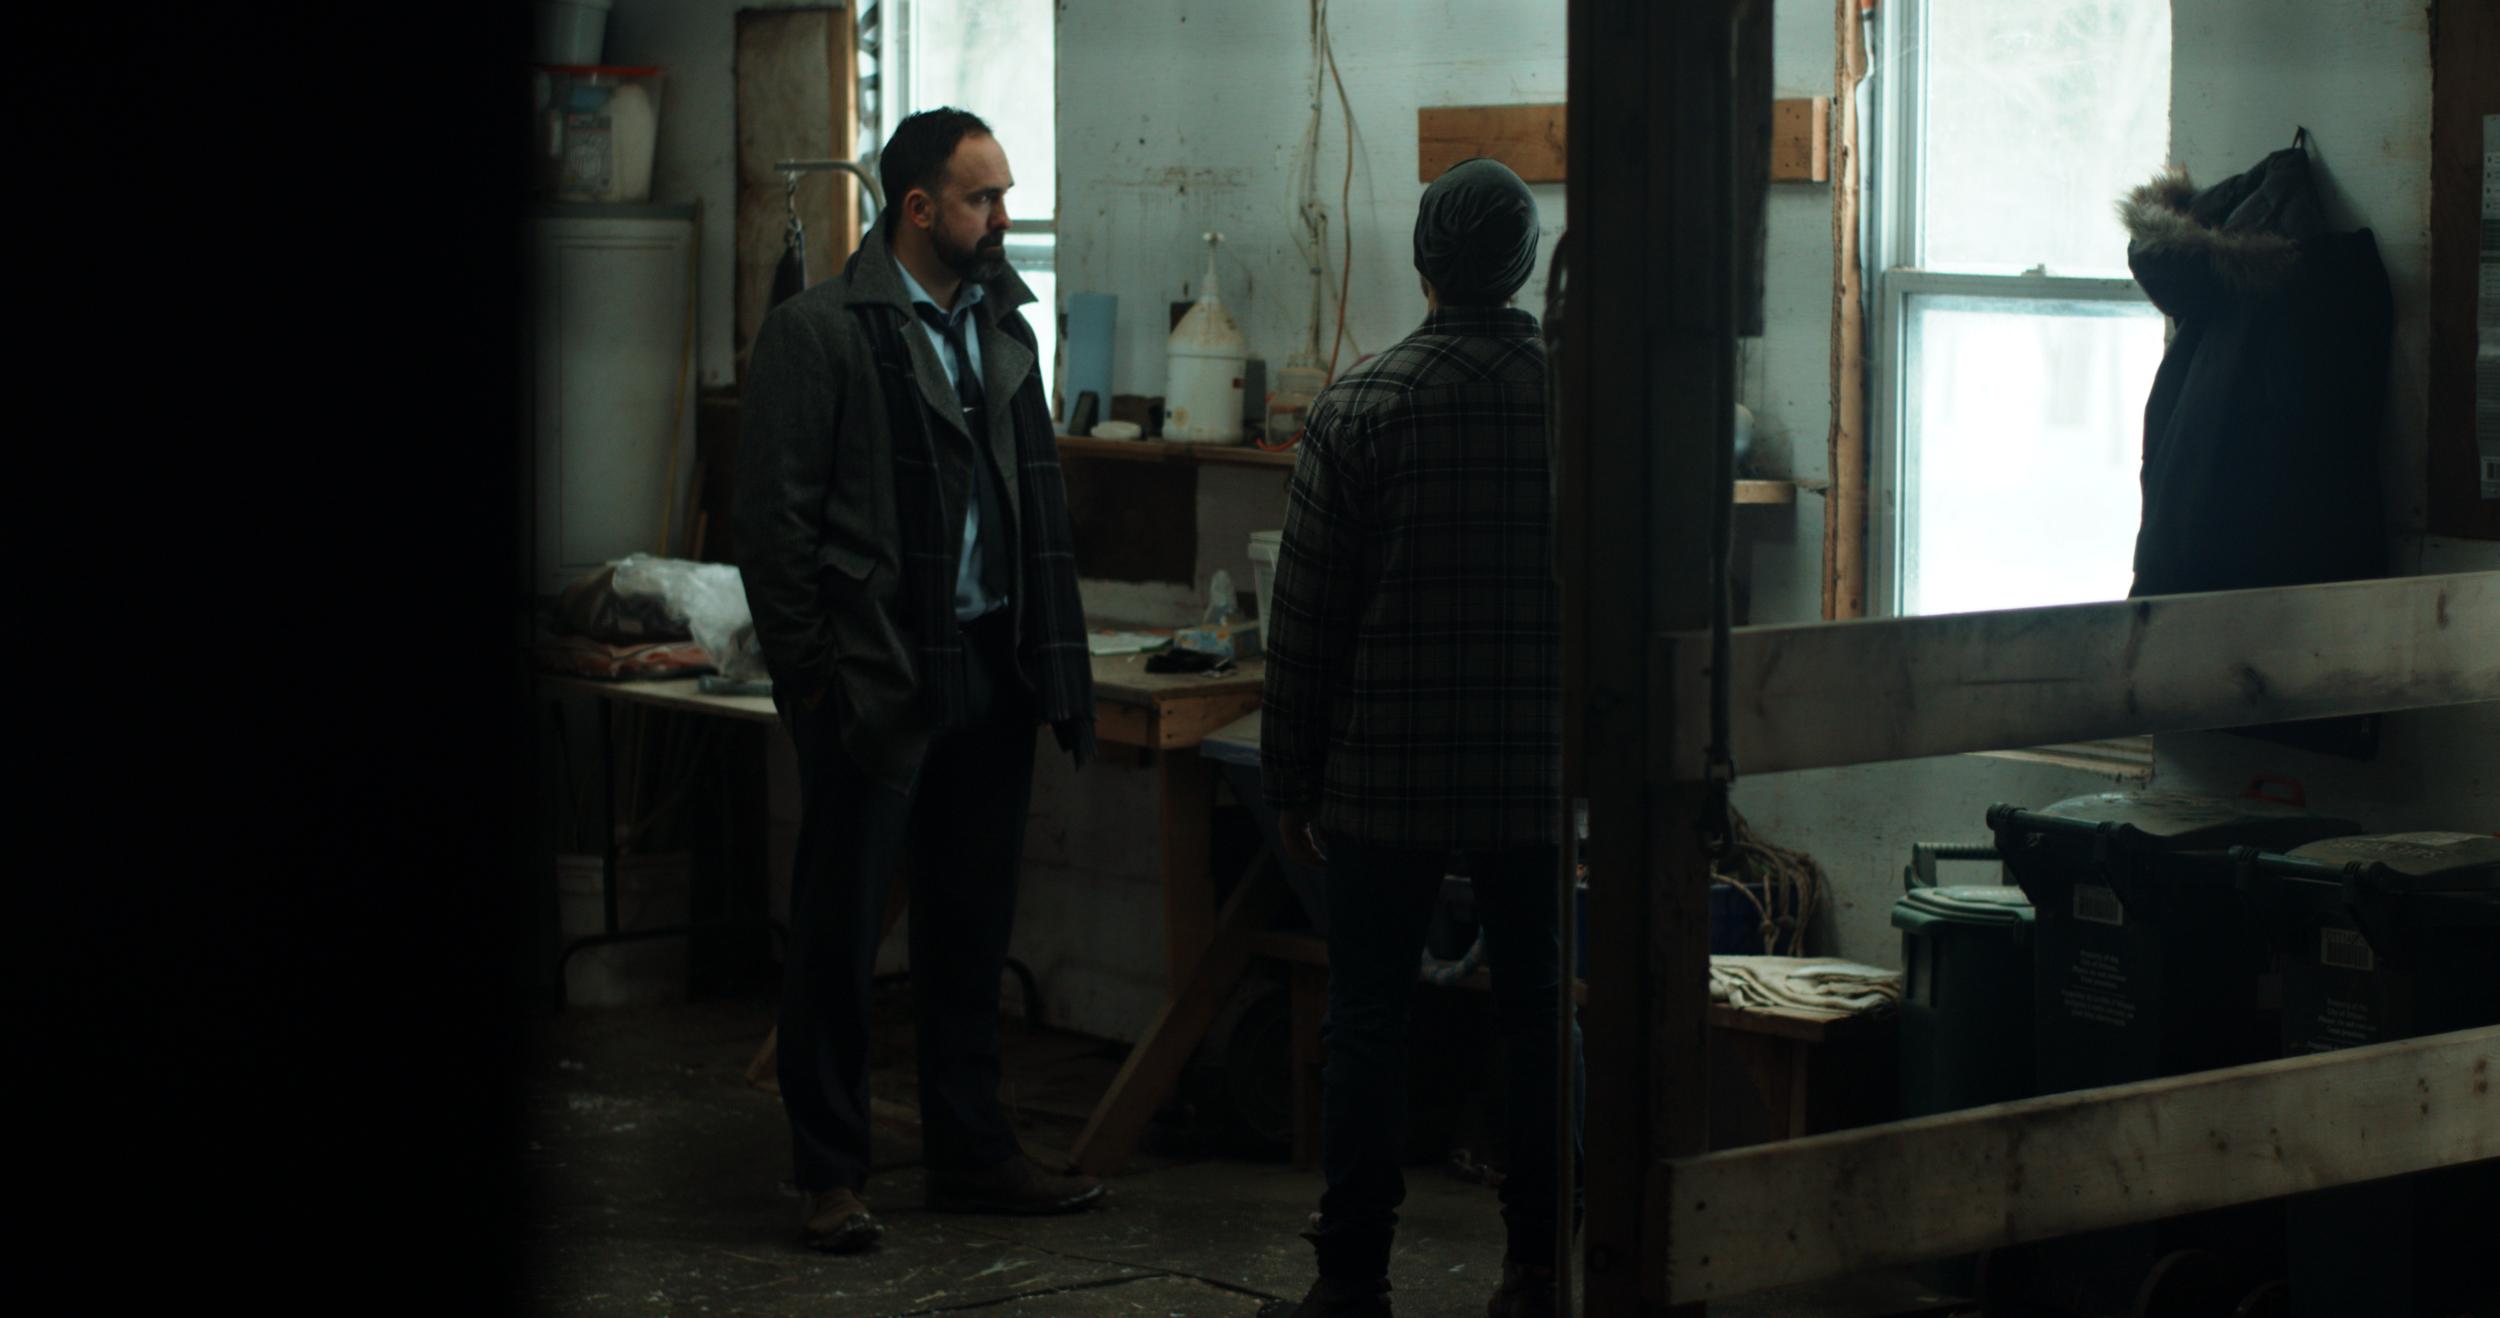 The Doe (feature film) Dir. Derek Price, Prod./Writer Emily Ramsay